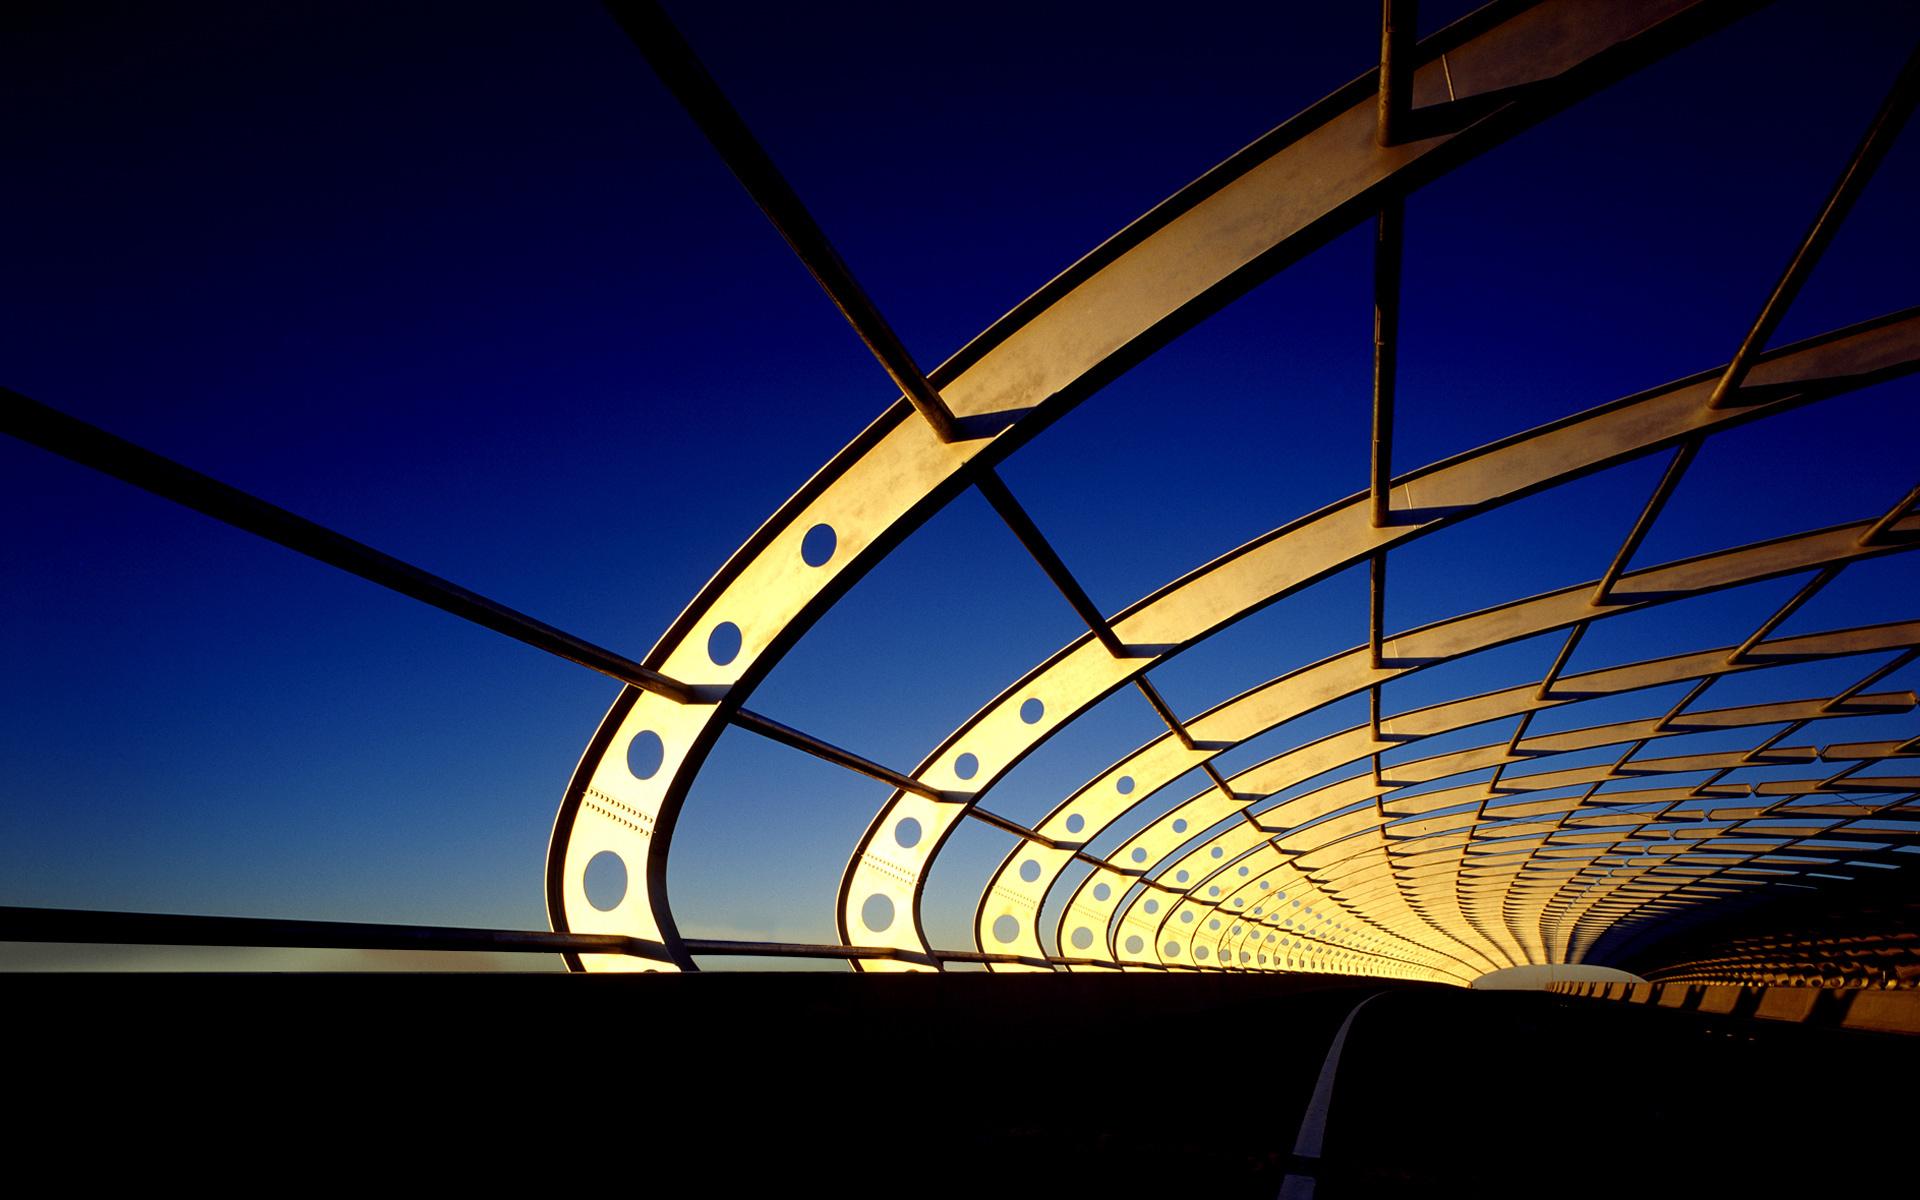 Wallpaper-windows-design-wallpapers-architecture-forum-38893